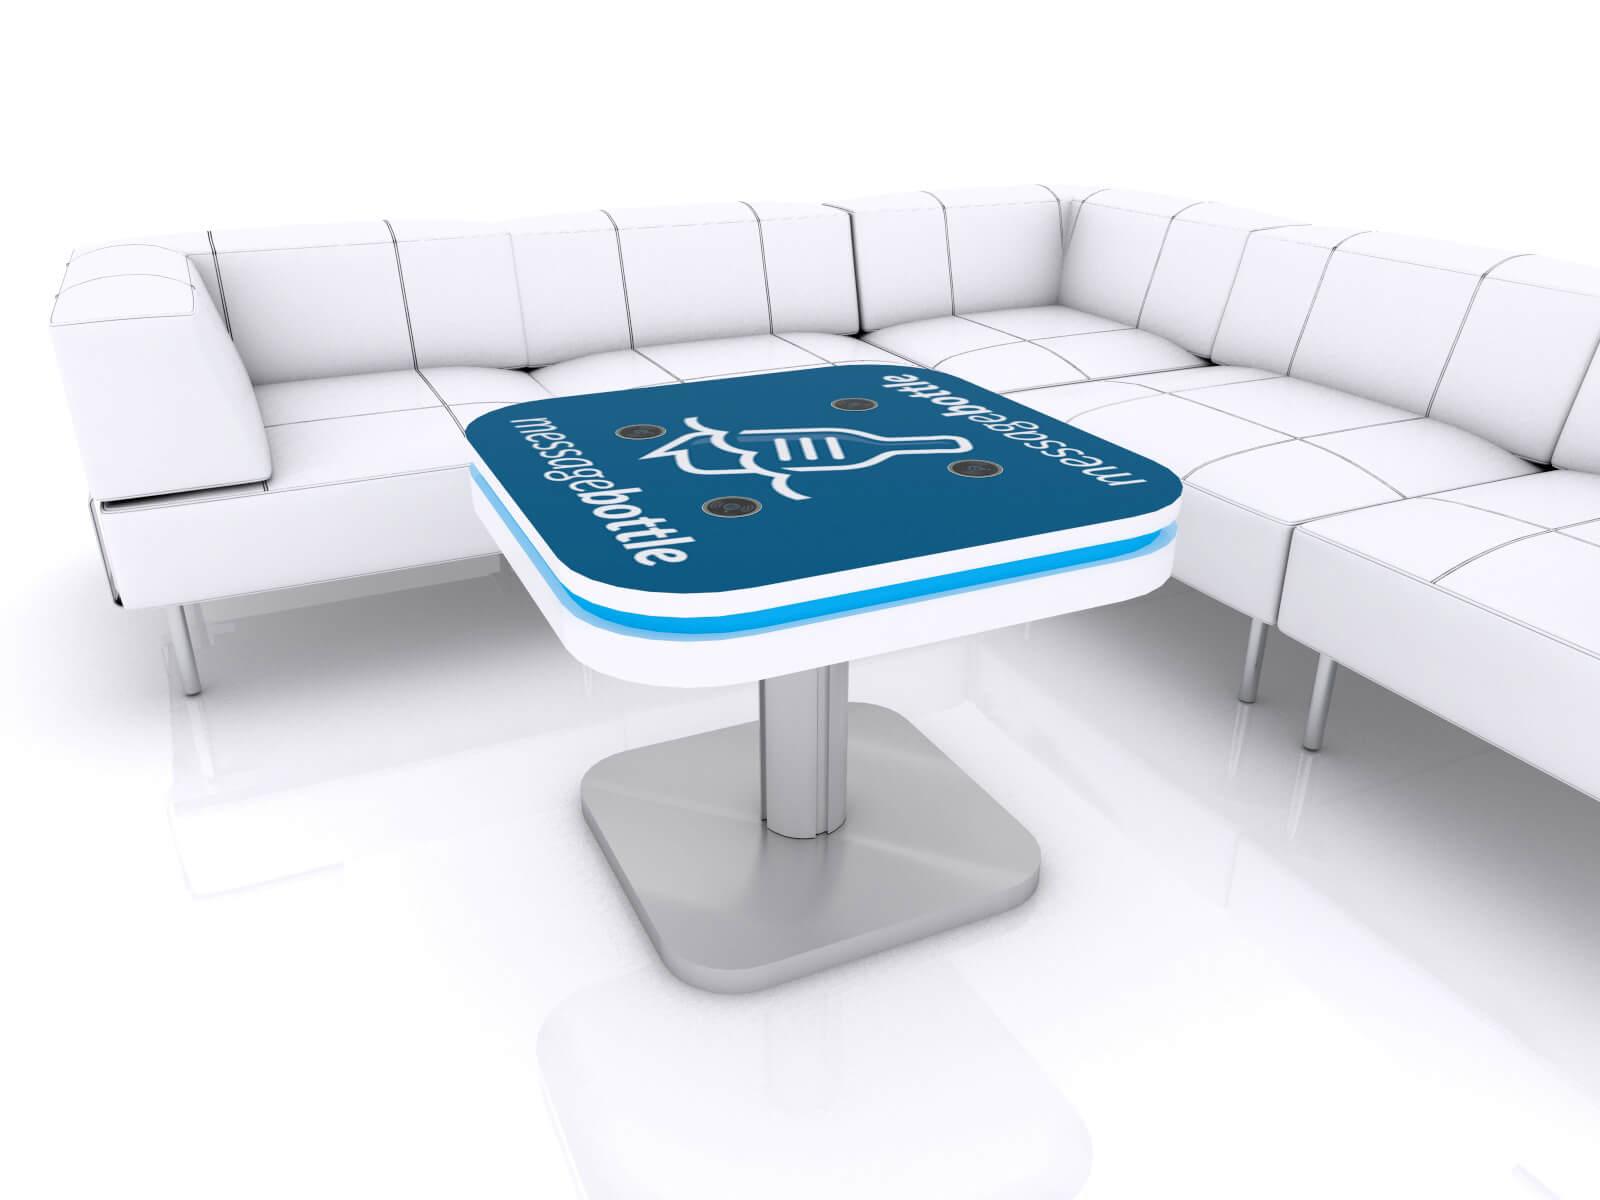 MOD-1455 Wireless Charging Coffee Table